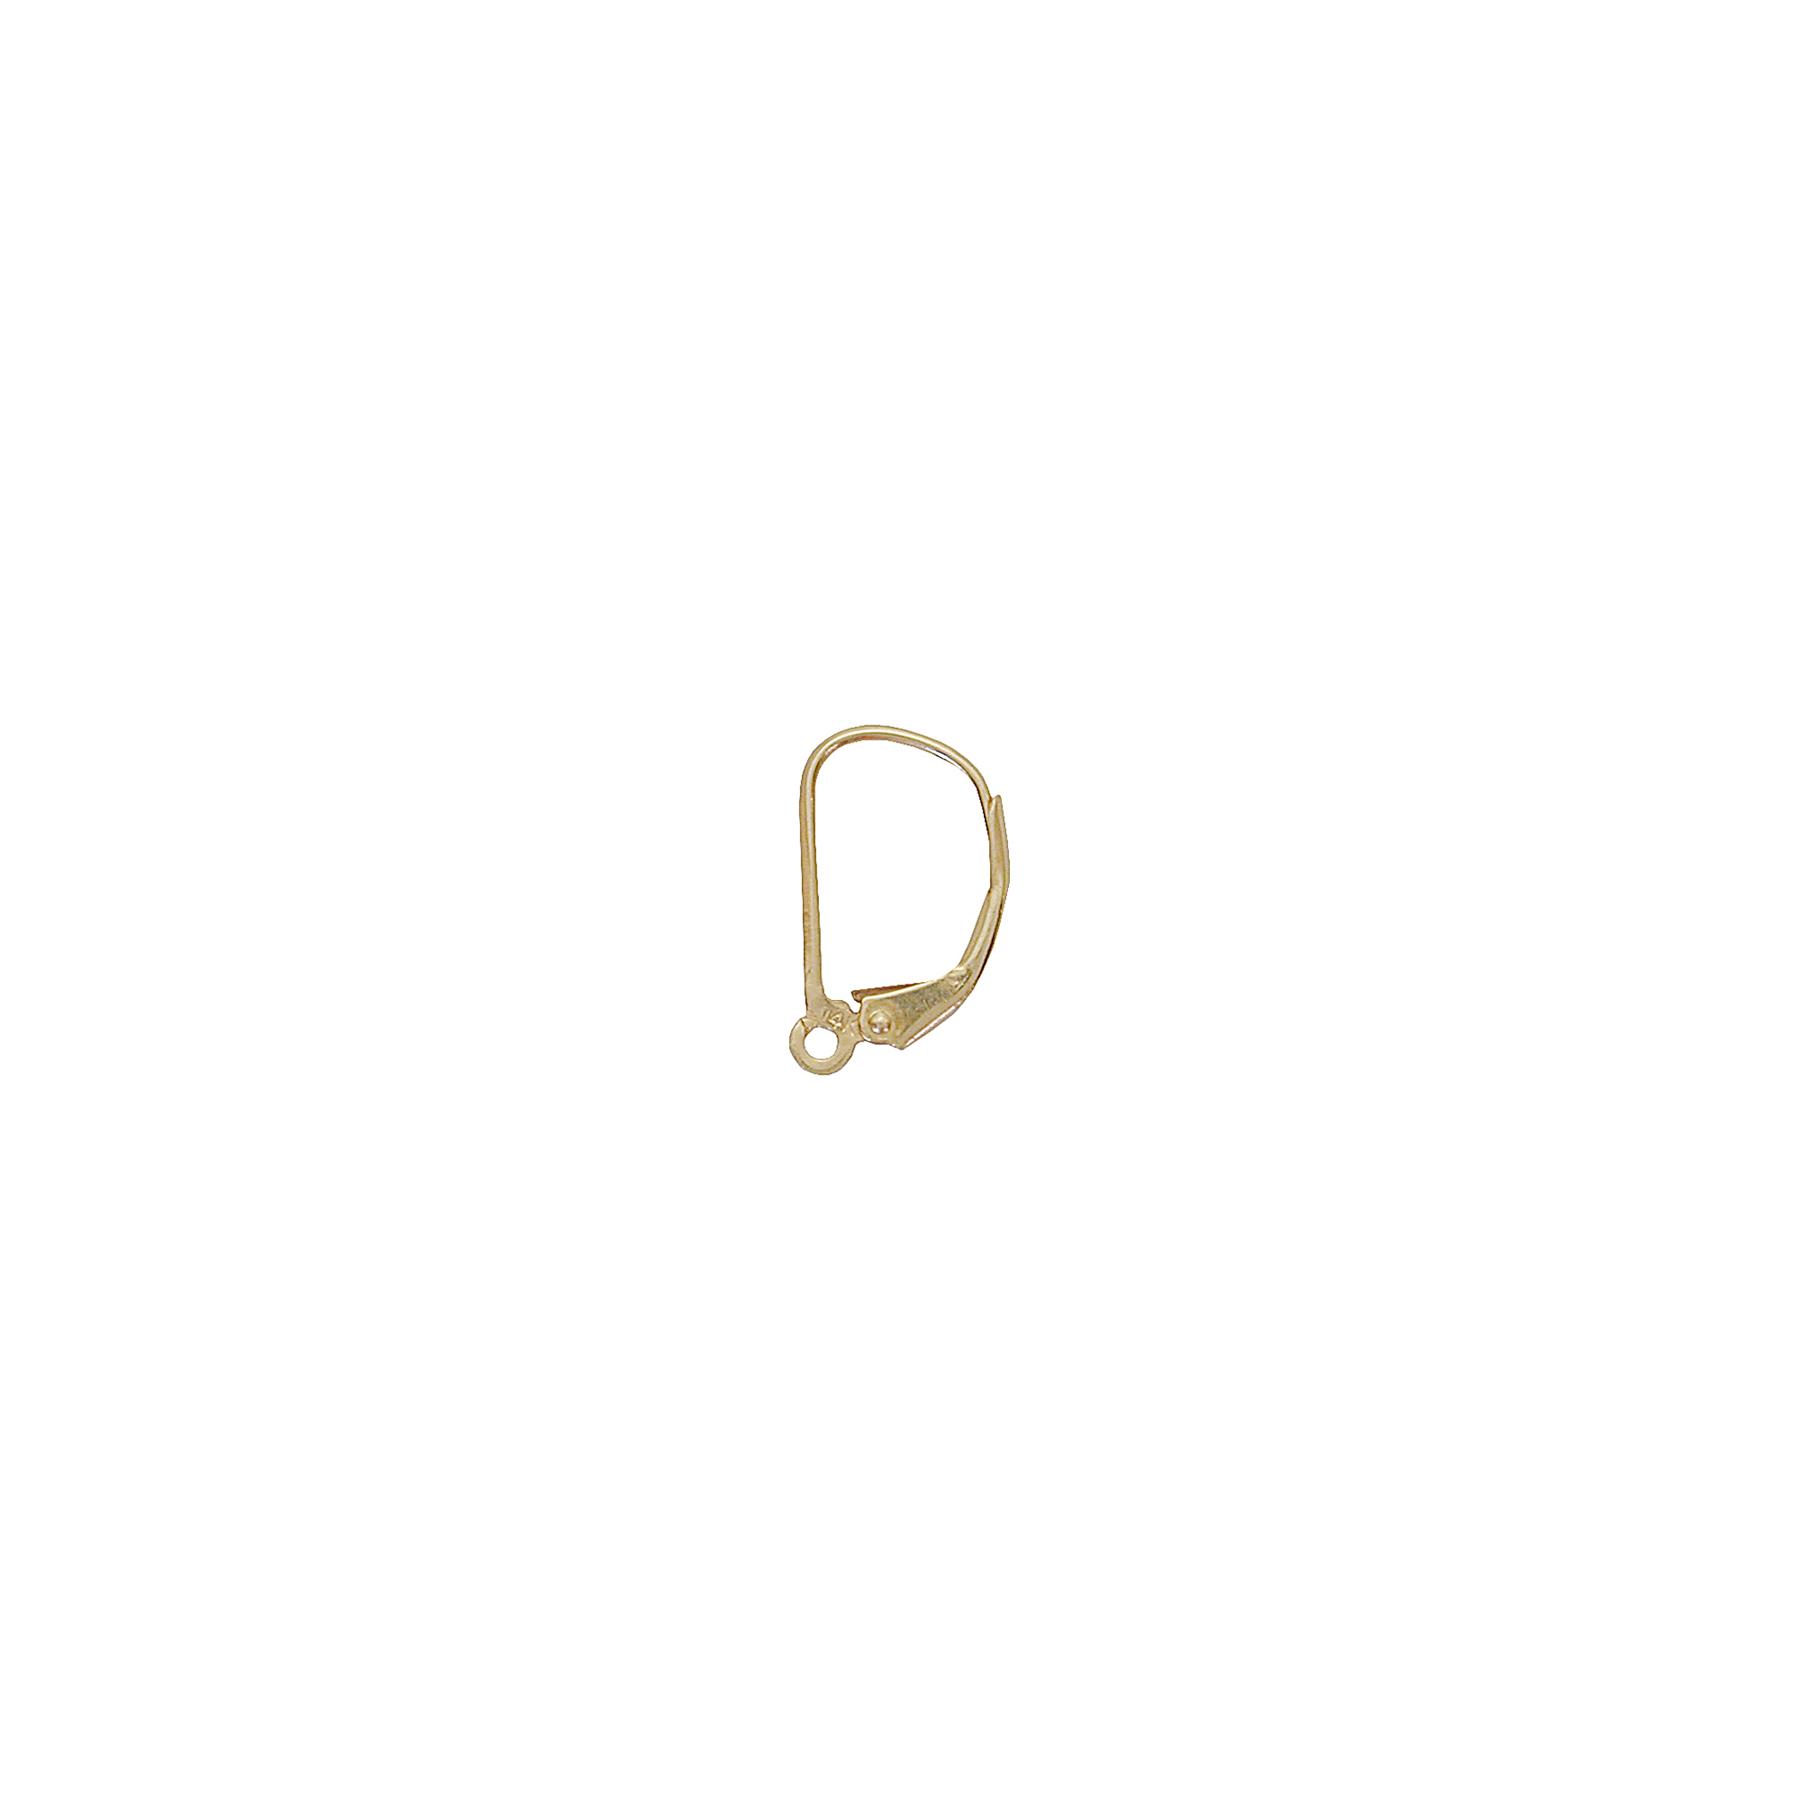 14k Gold Leverback Earring W Ring